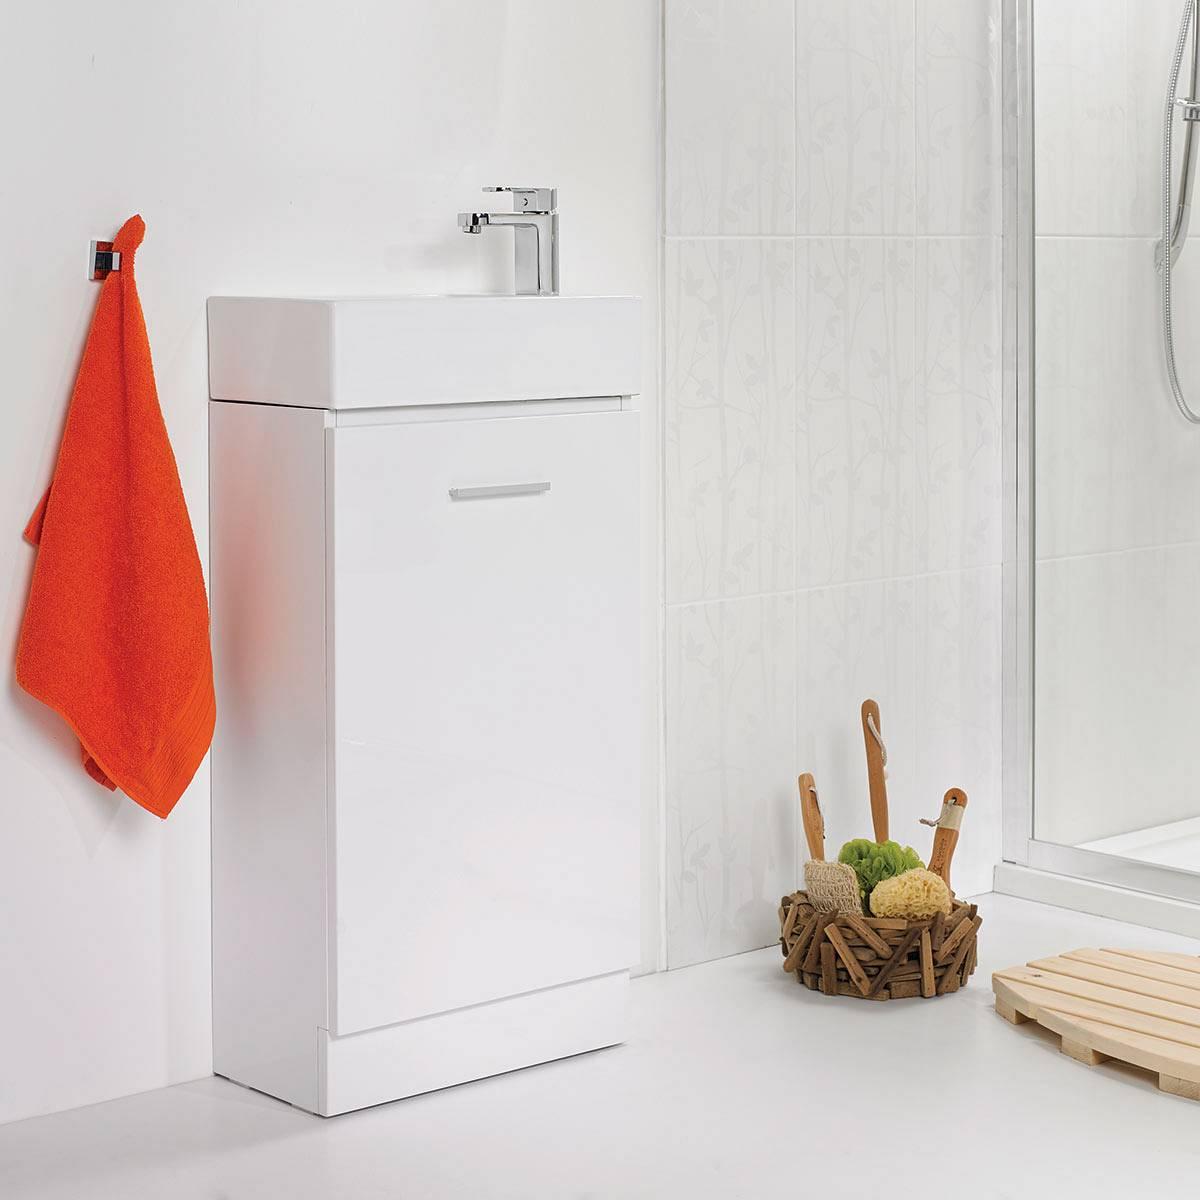 Planning a Cloakroom Bathroom   VictoriaPlum.com